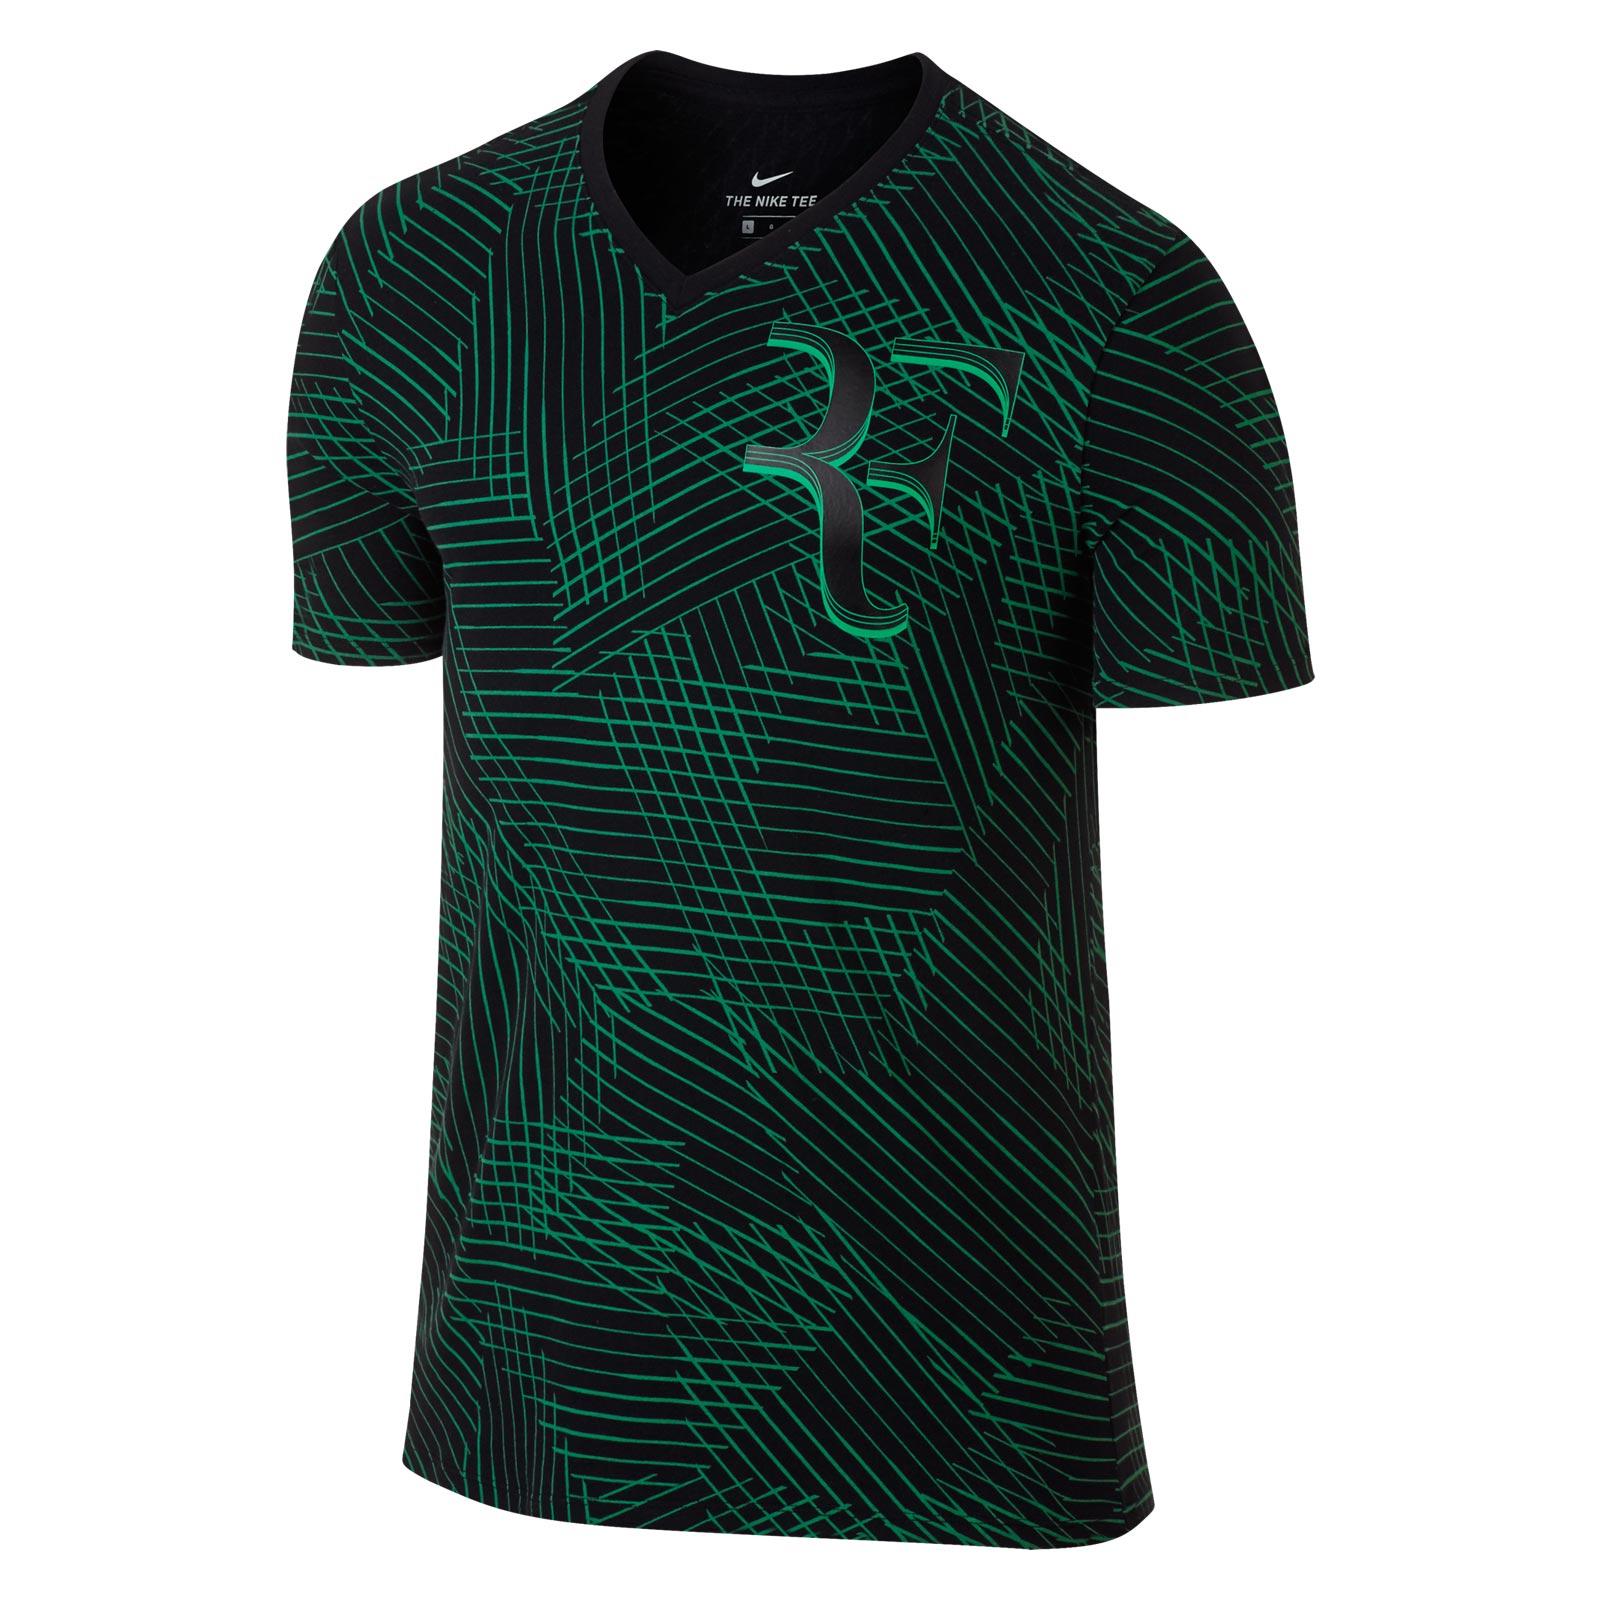 Roger Federer 2017 Indian Wells NikeCourt Roger Federer